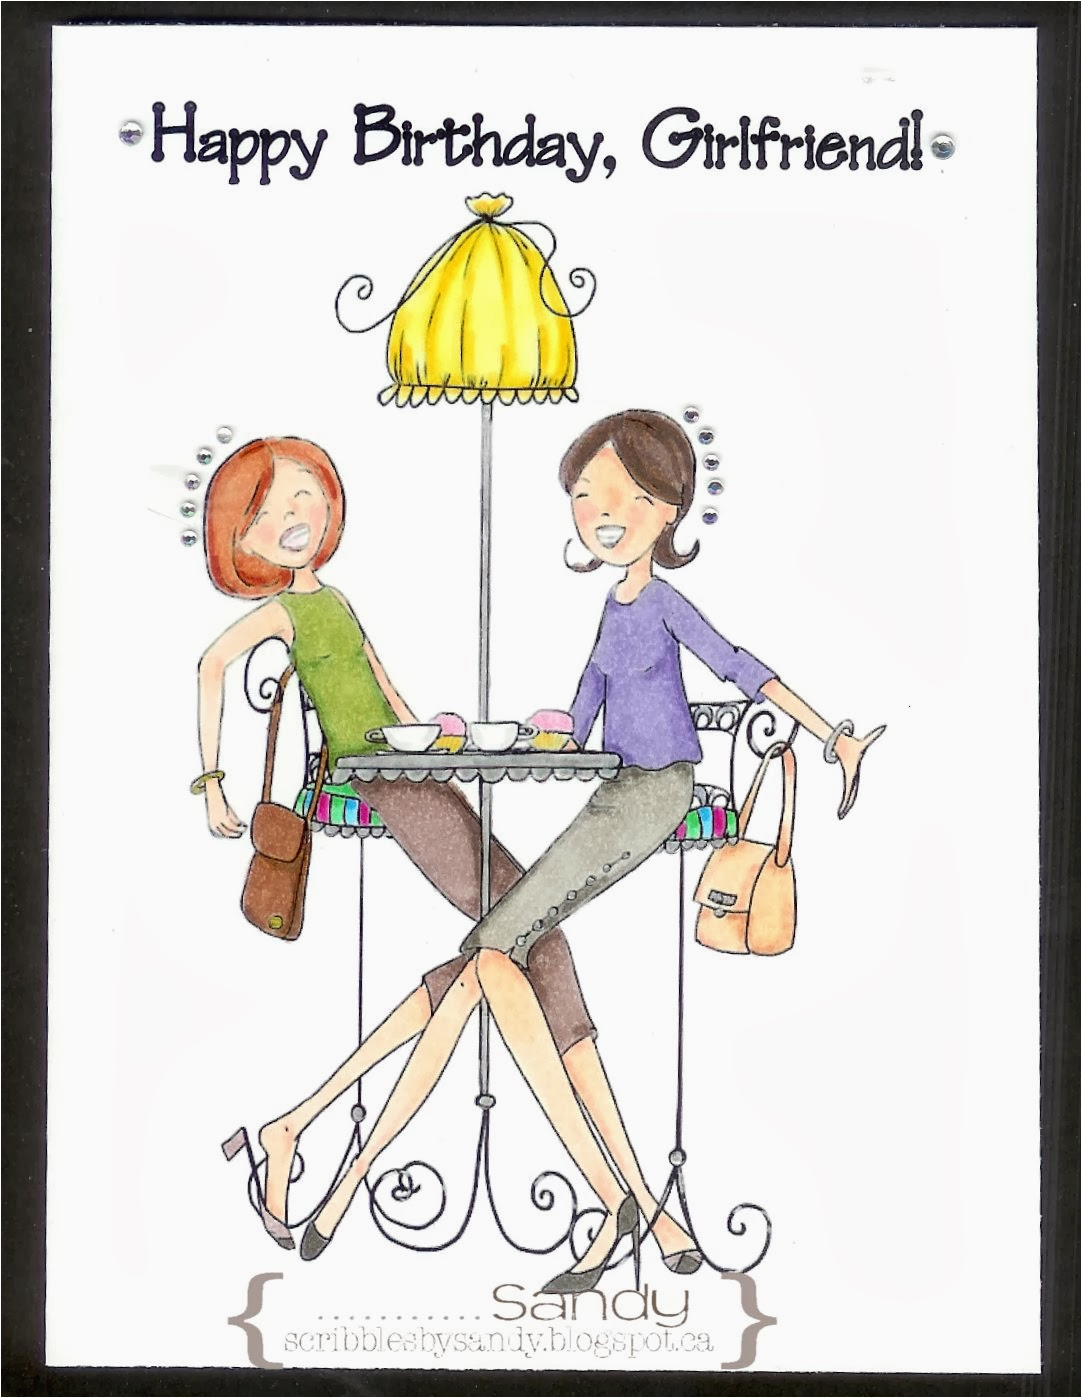 Happy Birthday Girlfriend Scribbles by Sandy August 2013